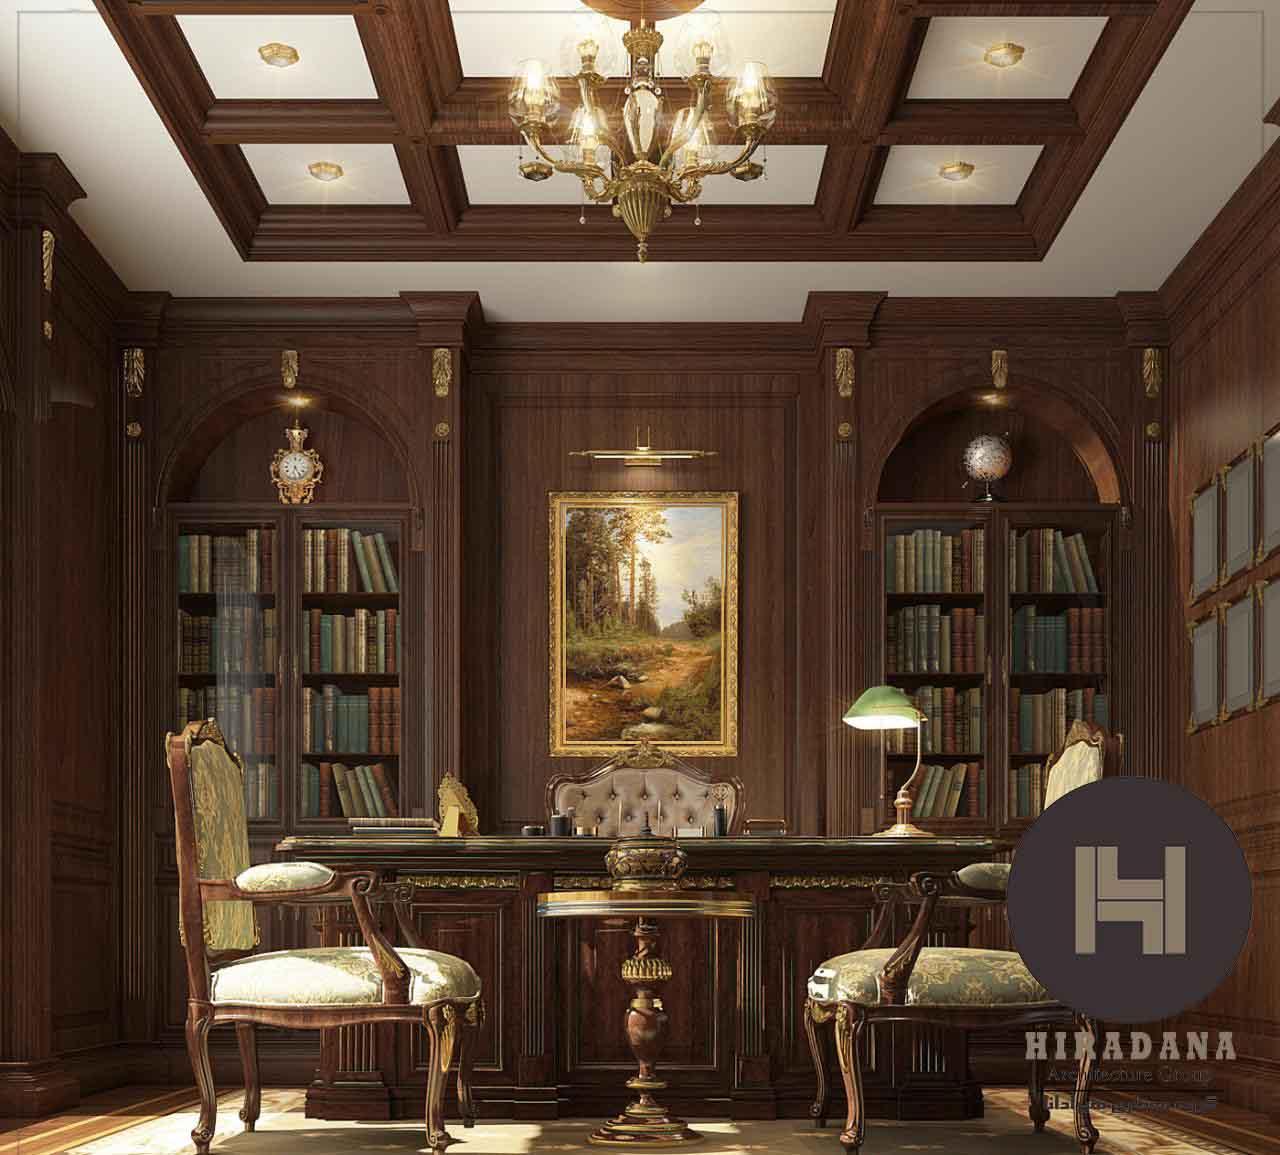 طراحی دکوراسیون اداری با سبک کلاسیک